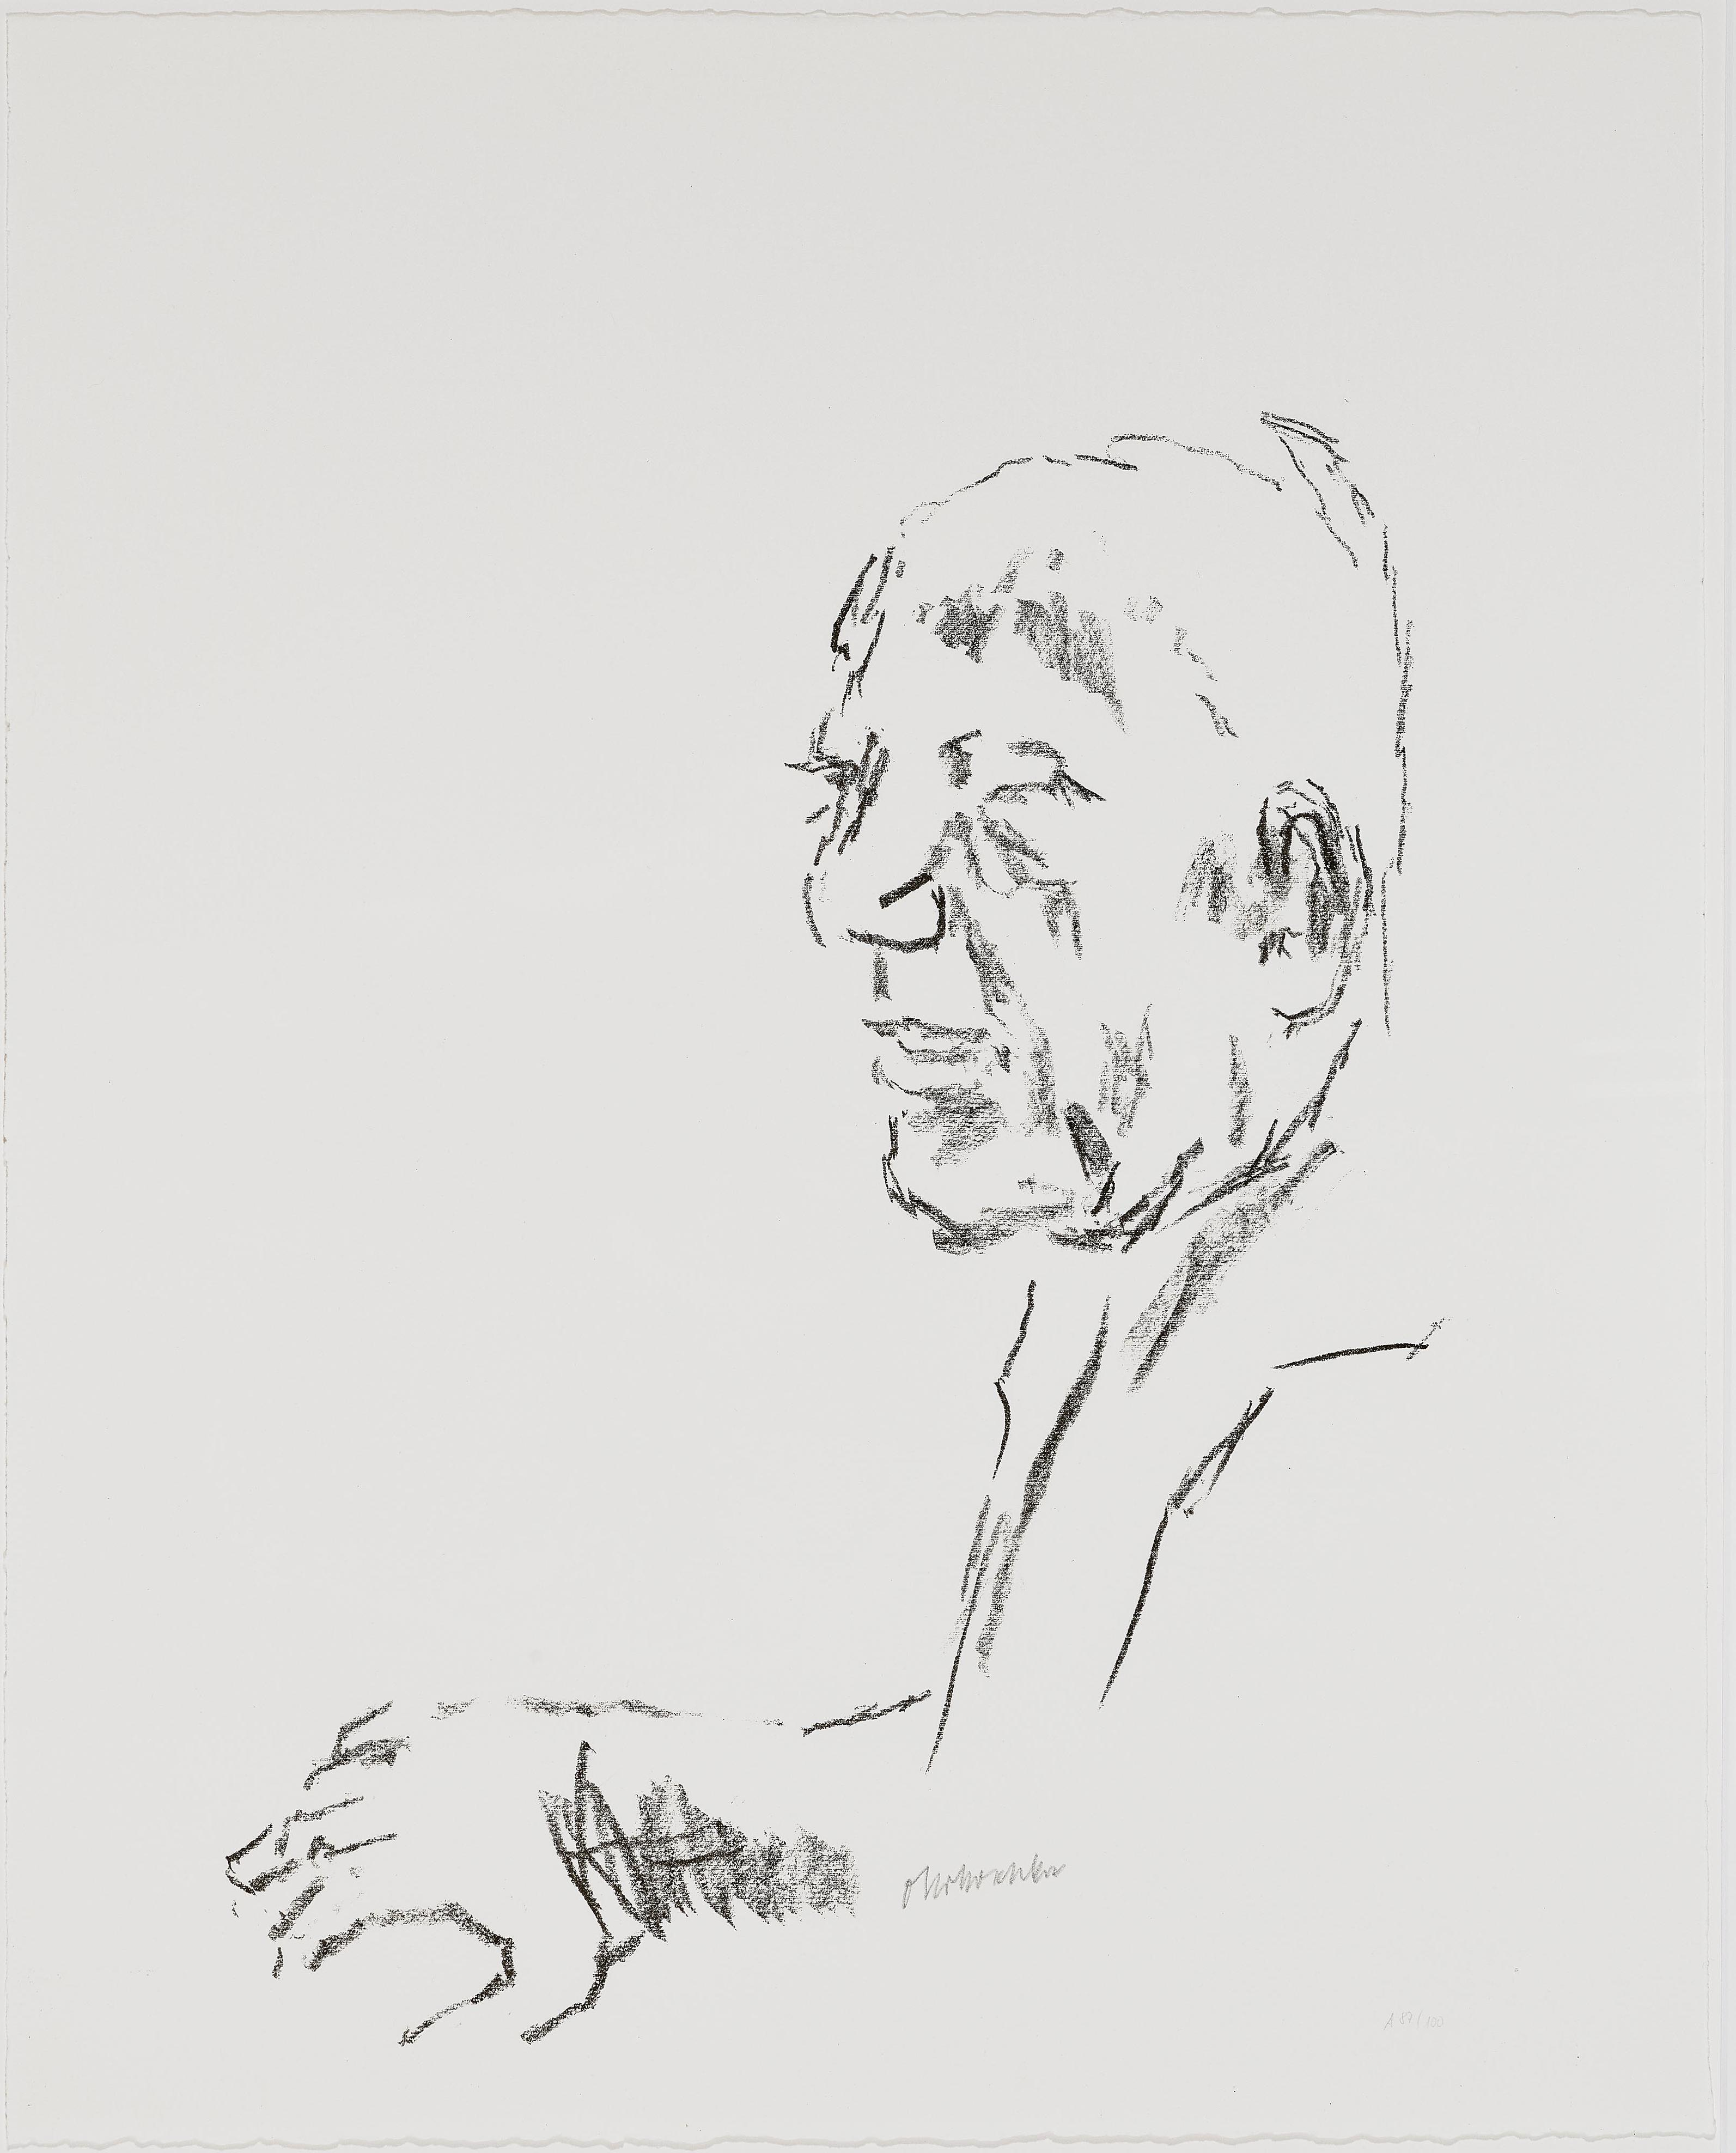 Oskar Kokoschka-Selbstportrat Aus Comenius - Figuren Und Szenen Des Dramas (Self-Portrait)-1975